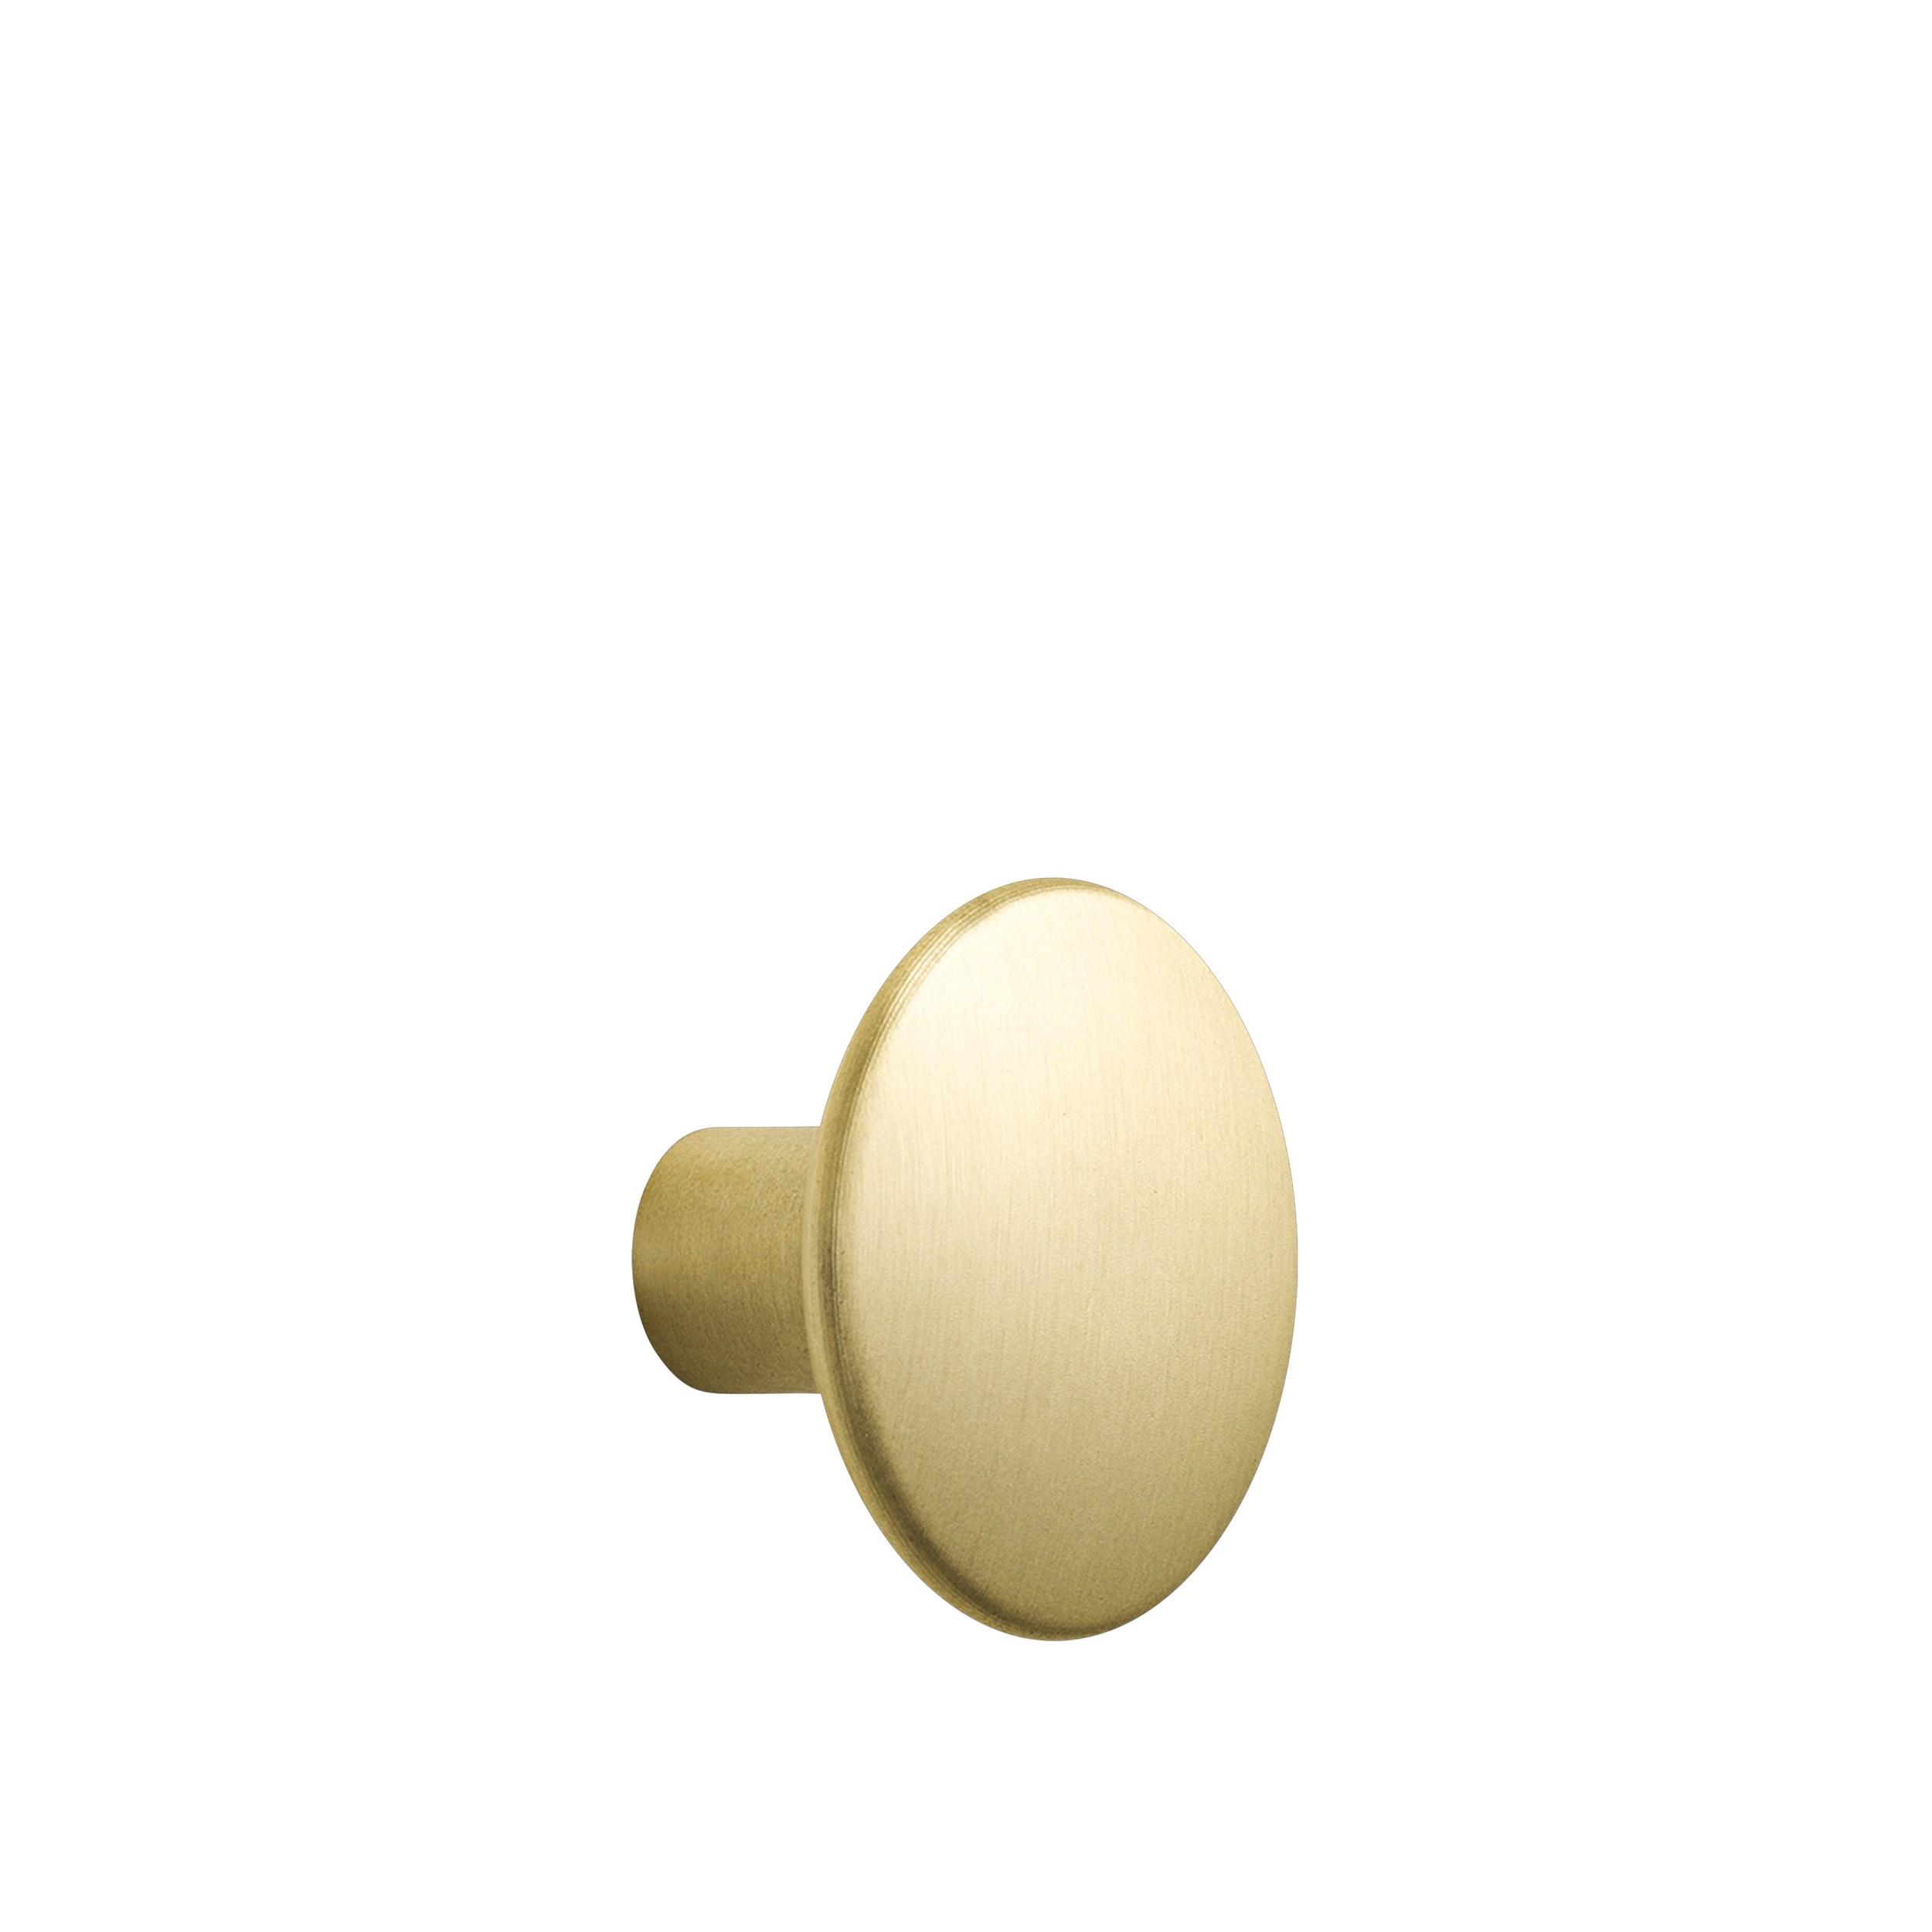 Dots metal large Ø 5 cm brass